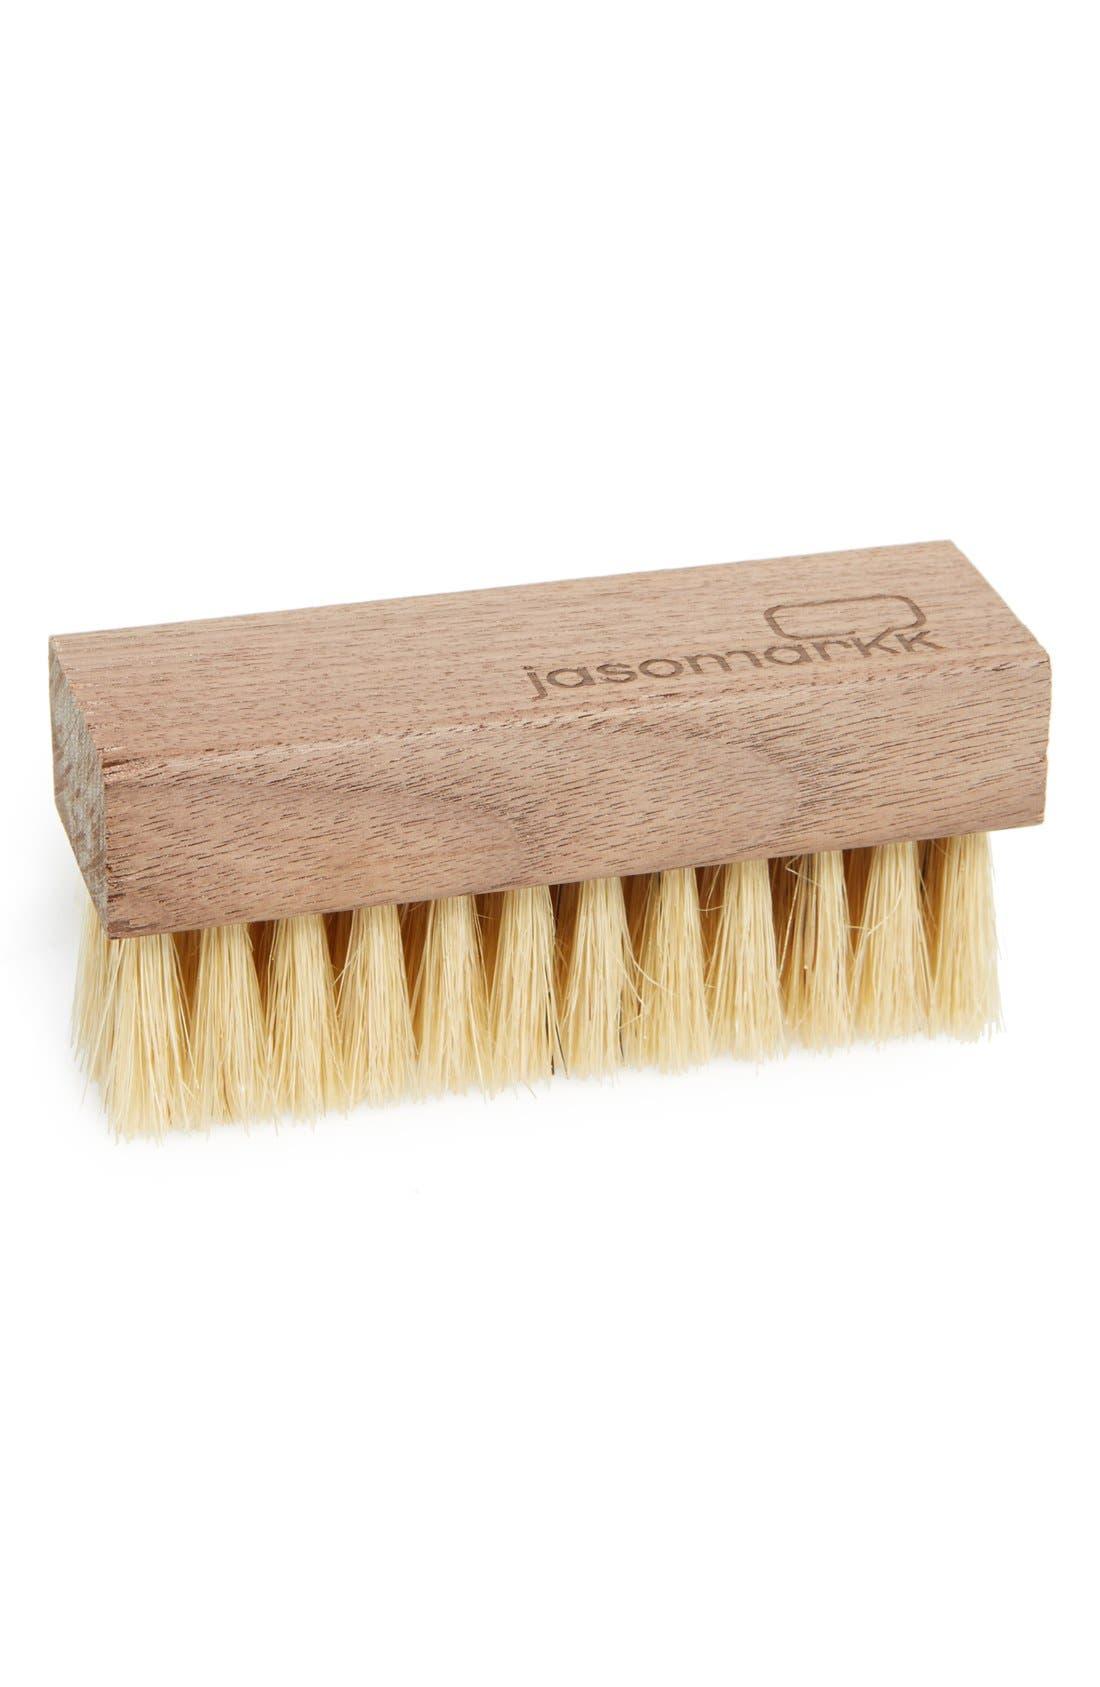 Premium Shoe Cleaning Brush,                         Main,                         color, BROWN